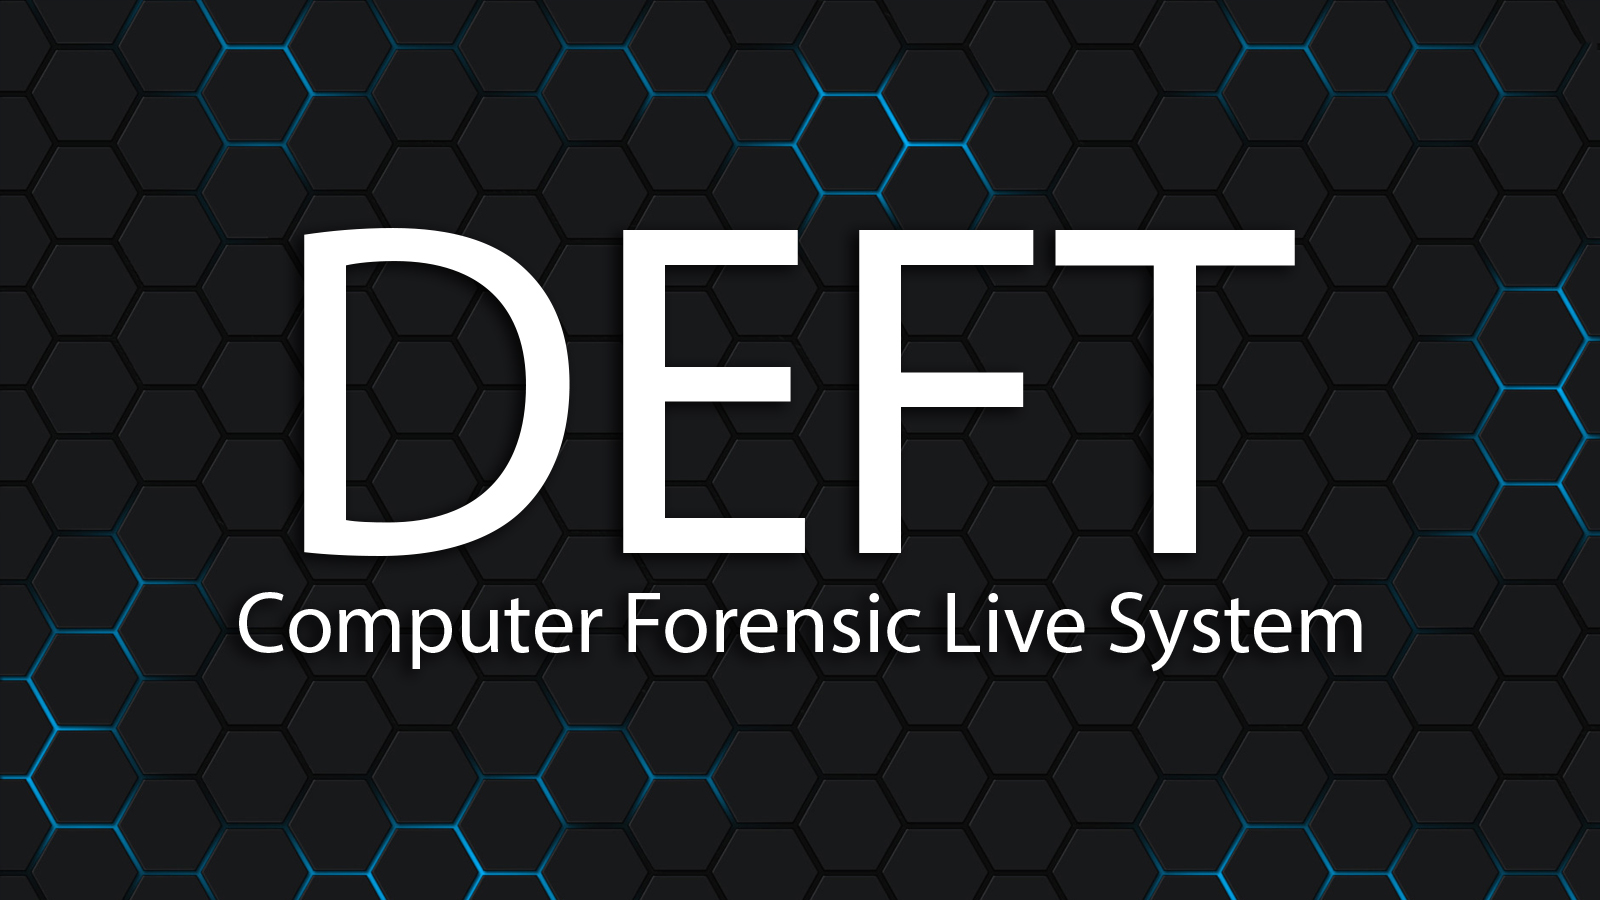 DEFT - Computer Forensic Live System